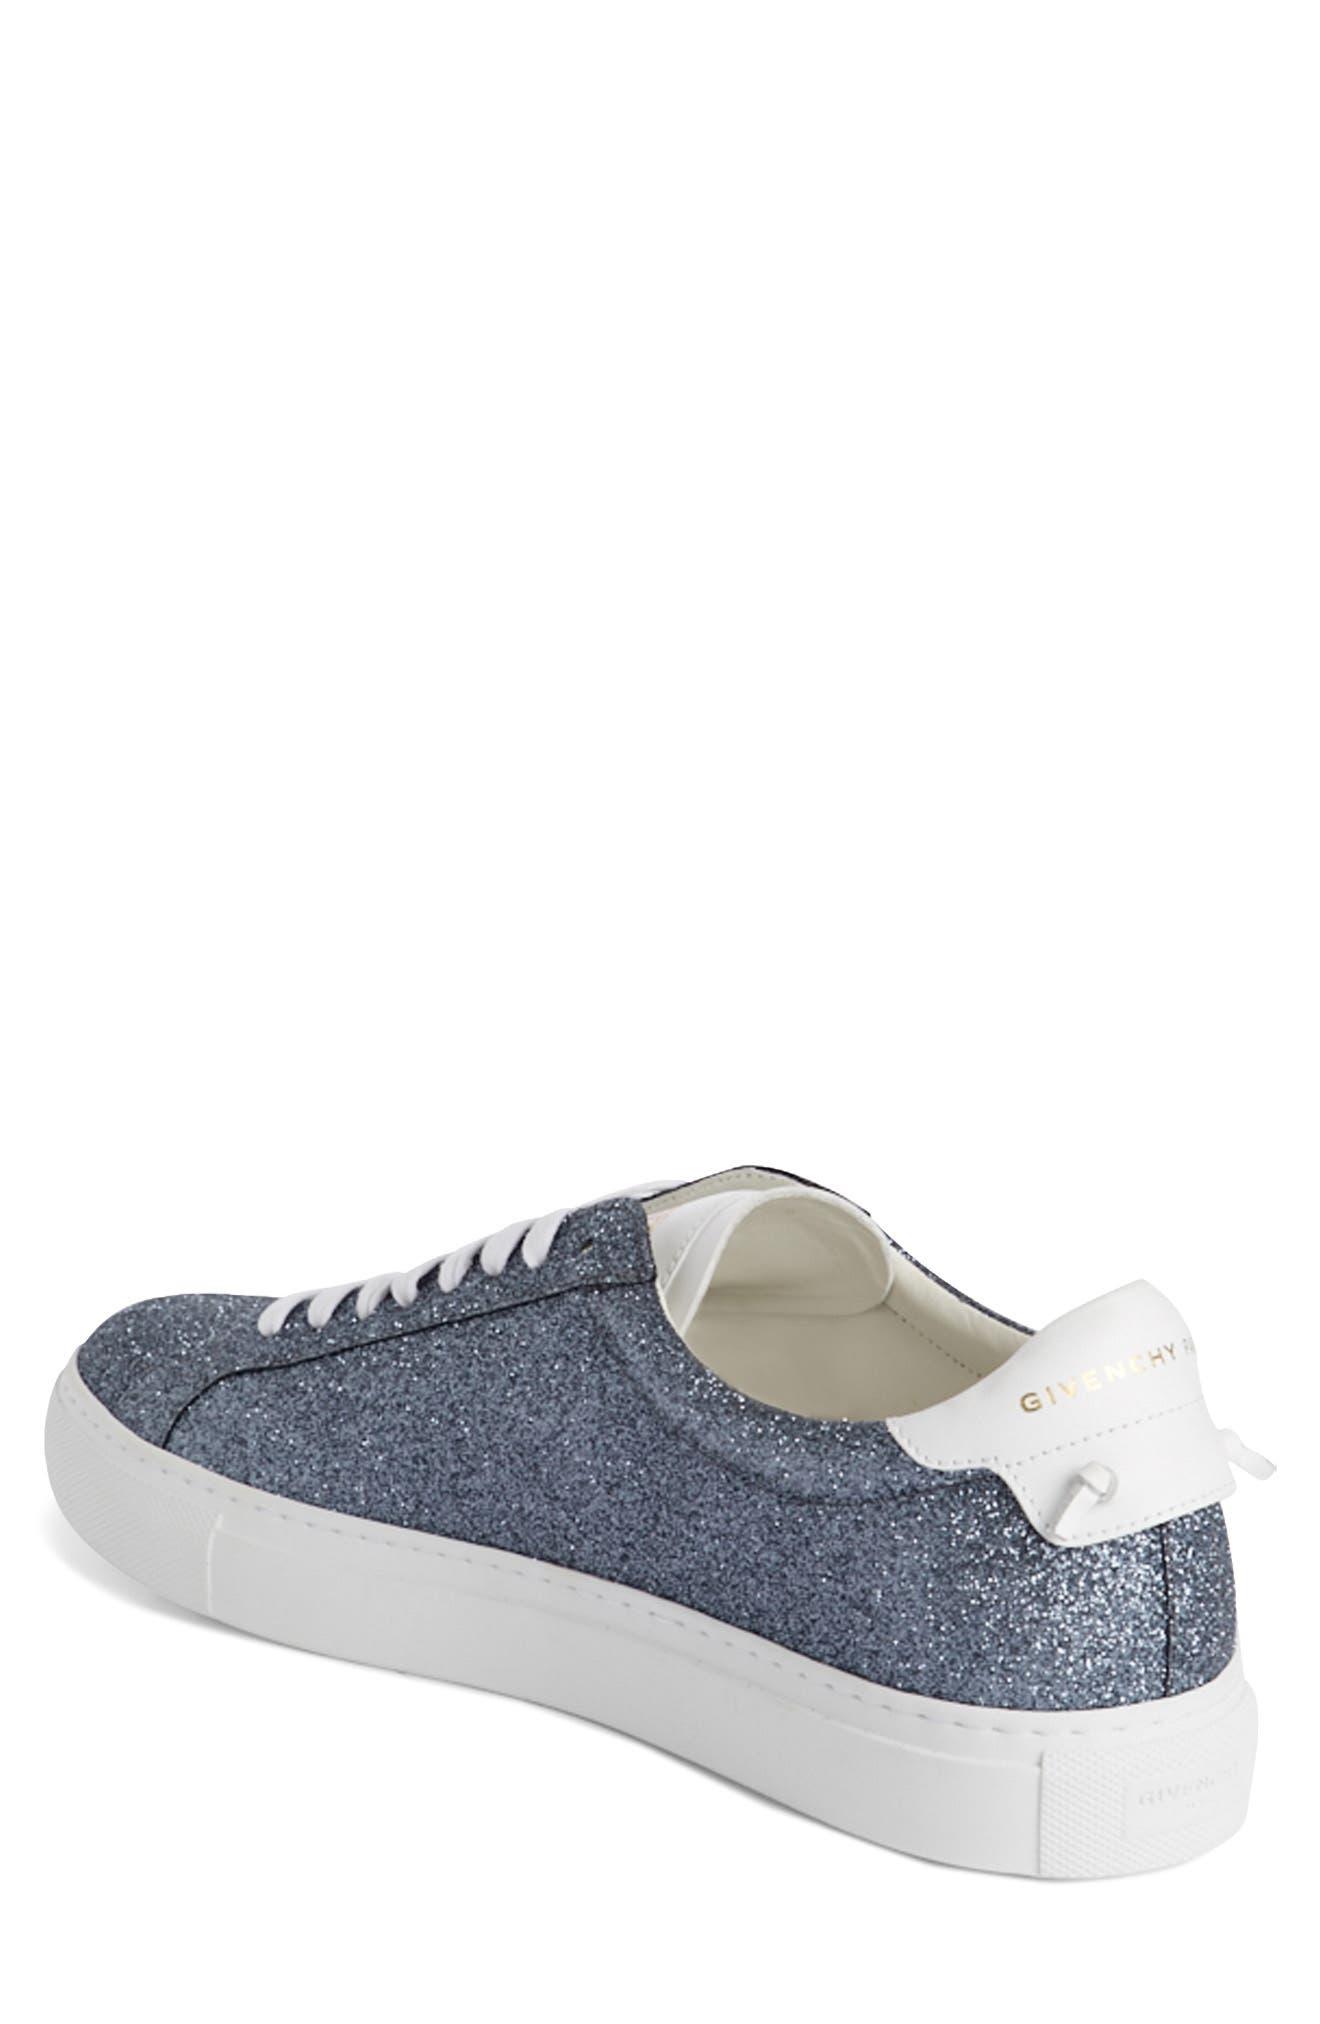 Urban Knots Glitter Sneaker,                             Alternate thumbnail 2, color,                             Grey